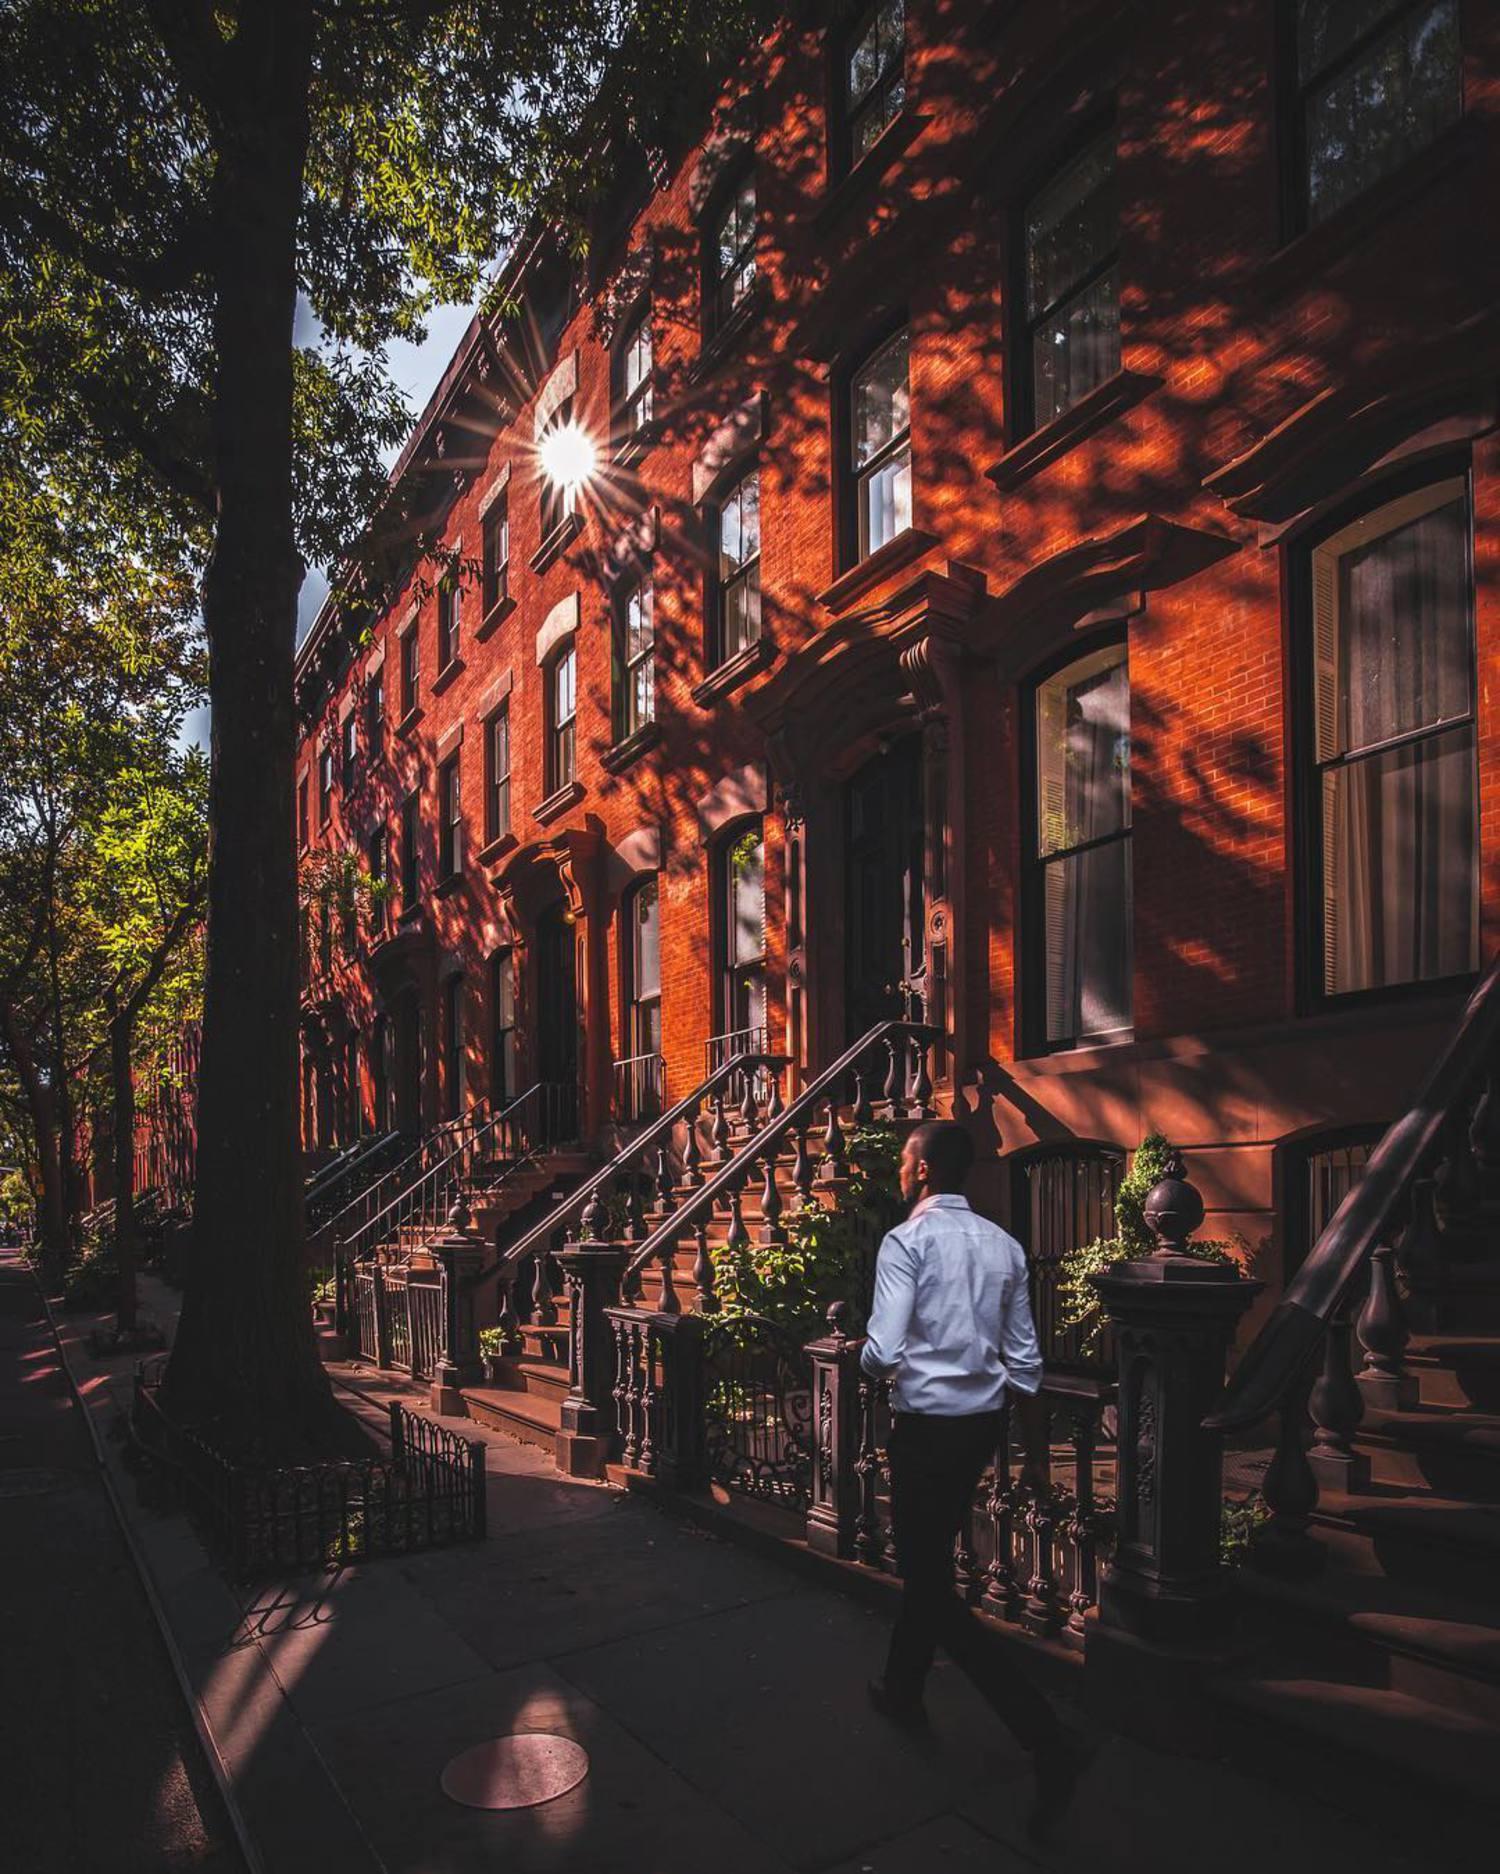 Guided by the light. . —•—•—•—•—•—•—•—•—•—•—•—•—•—•—•— . #NYC #newyorkcity #manhattan #ig_nycity #gf_nyc #cbviews #igersofnyc #nbc4ny #icapture_nyc #ig_worldclub #ig_mood #instagood #EmpireStateOfMind #exploringtheglobe #beautifuldestinations #thisisnewyorkcity #what_i_saw_in_nyc #topnewyorkphoto #canonbringit #nyc_community #seeyourcity #fox5ny #abc7ny #discovernewyork #loves_nyc #nypostny #whplocallegends . —•—•—•—•—•—•—•—•—•—•—•—•—•—•—•—